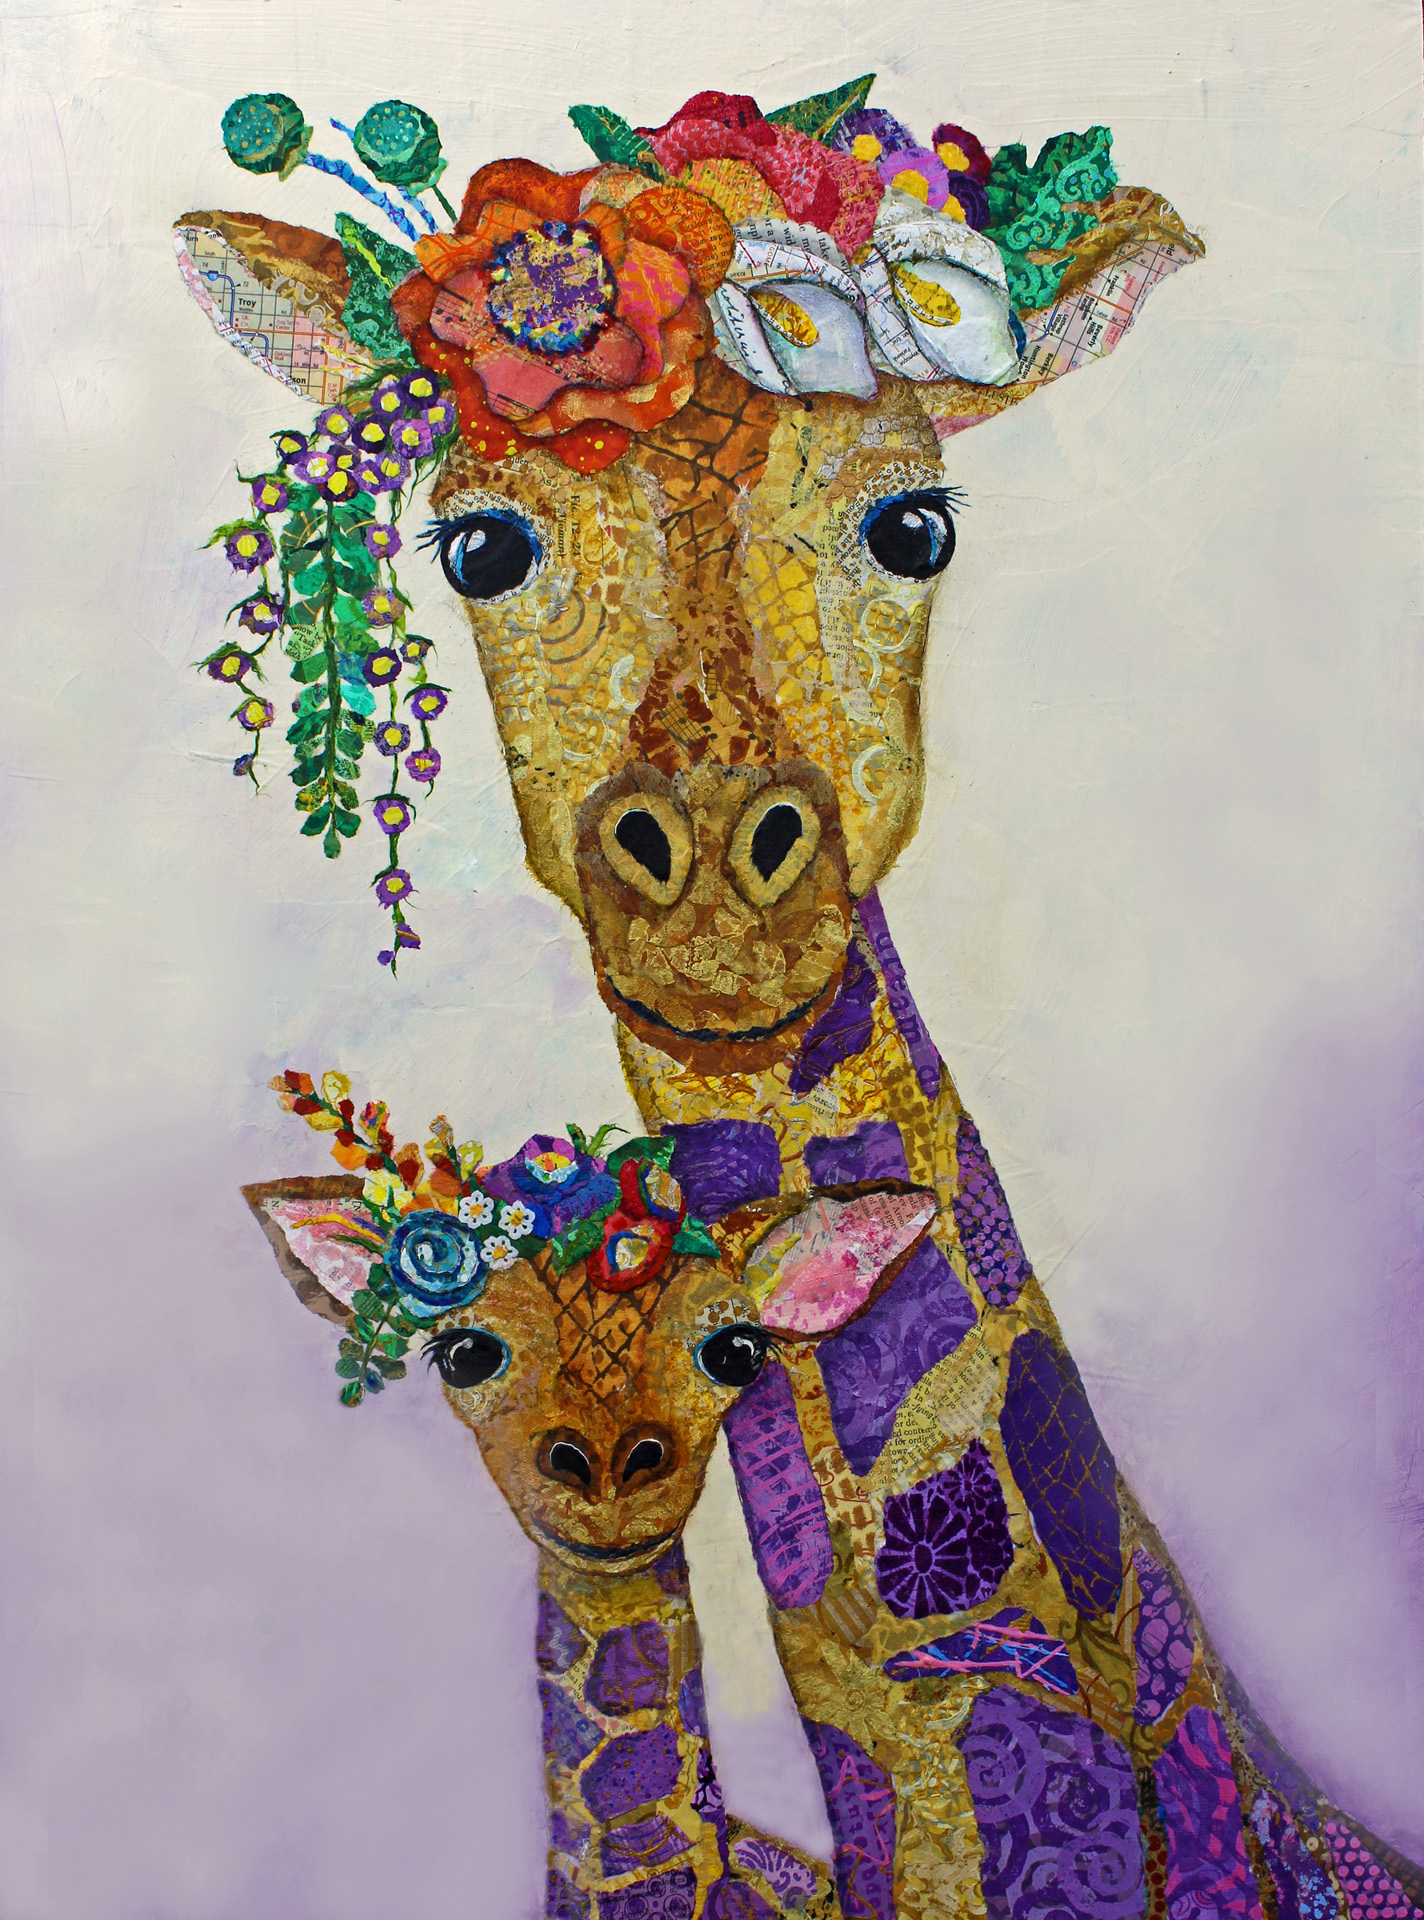 Giraffe GG.jpg